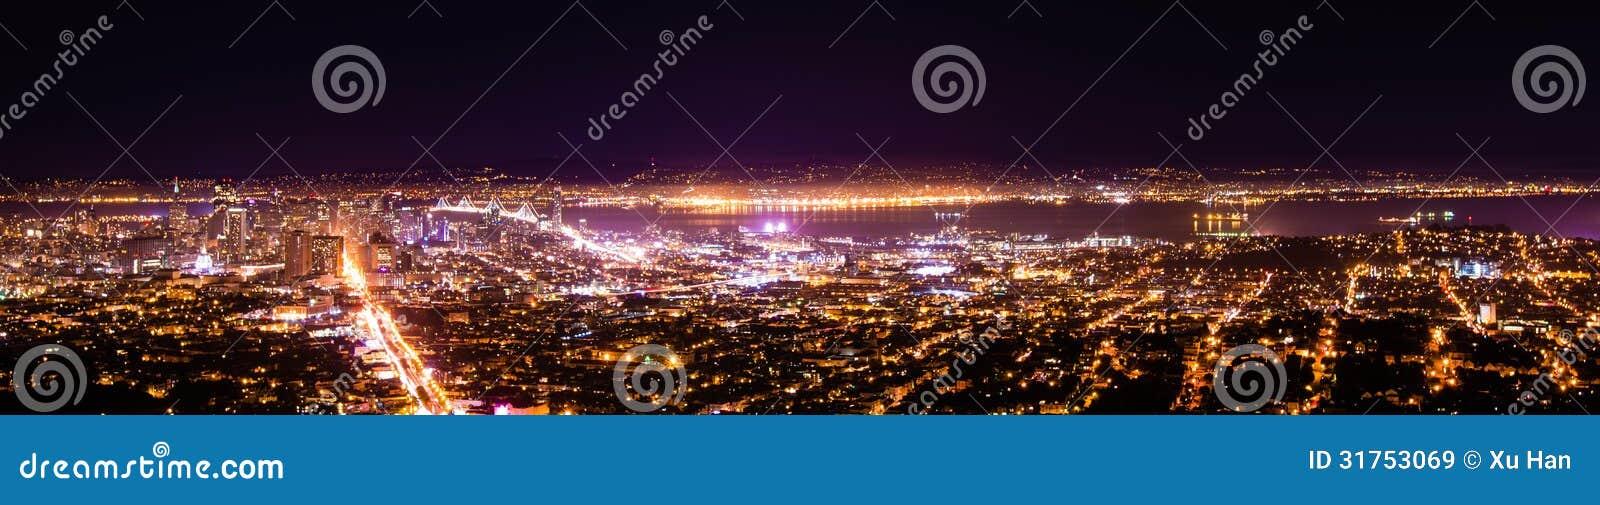 San Francisco s Night